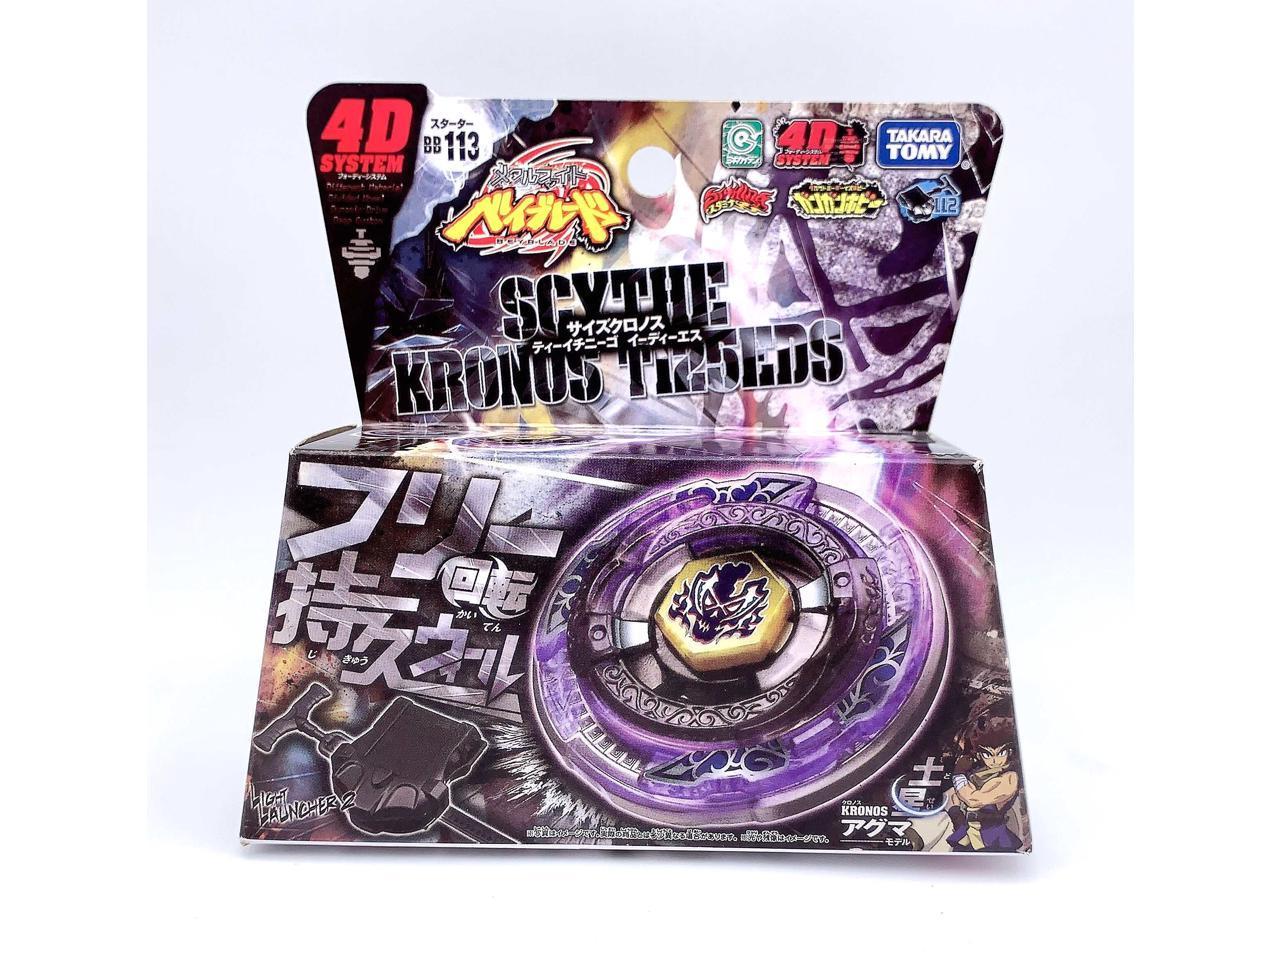 Takara Tomy Japanese Beyblade BB113 Metal Fusion Starter Set Scythe Kronos